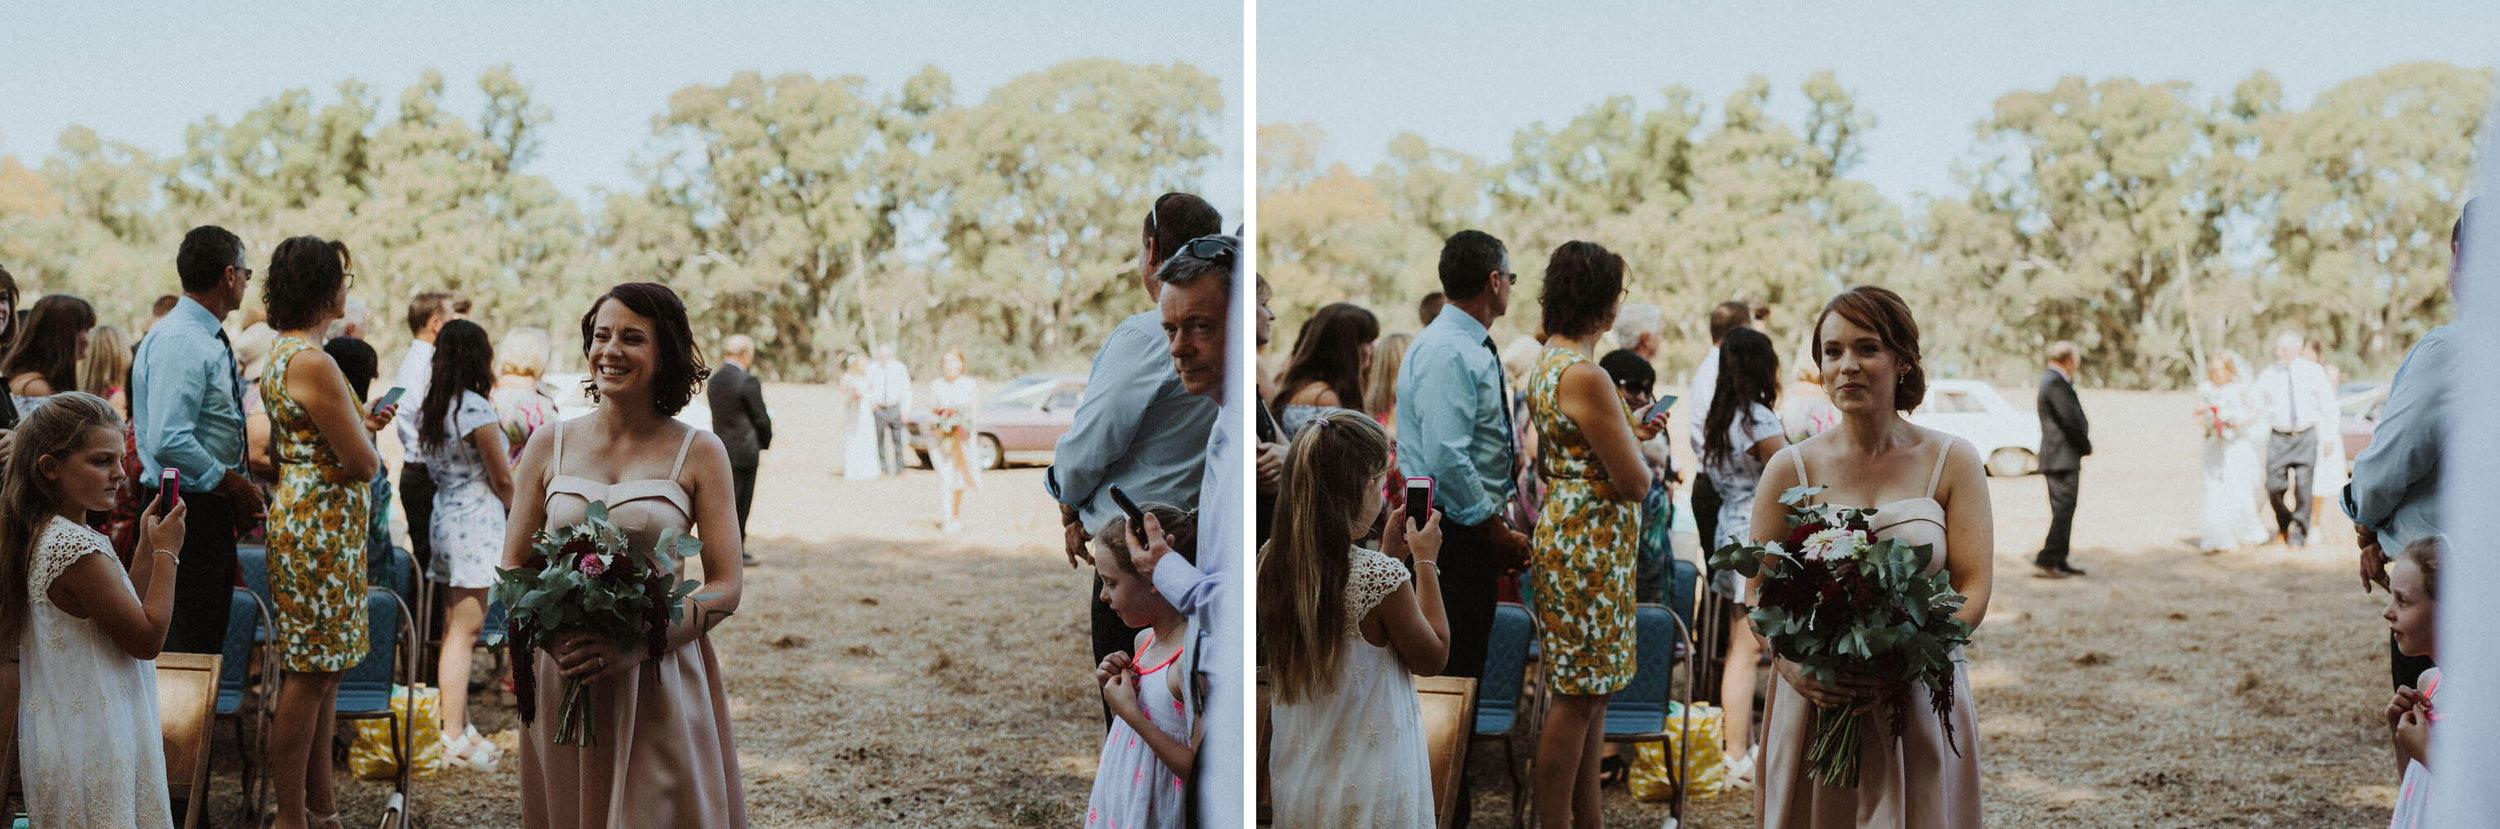 australian-wedding-photography_081(1434)2.jpg